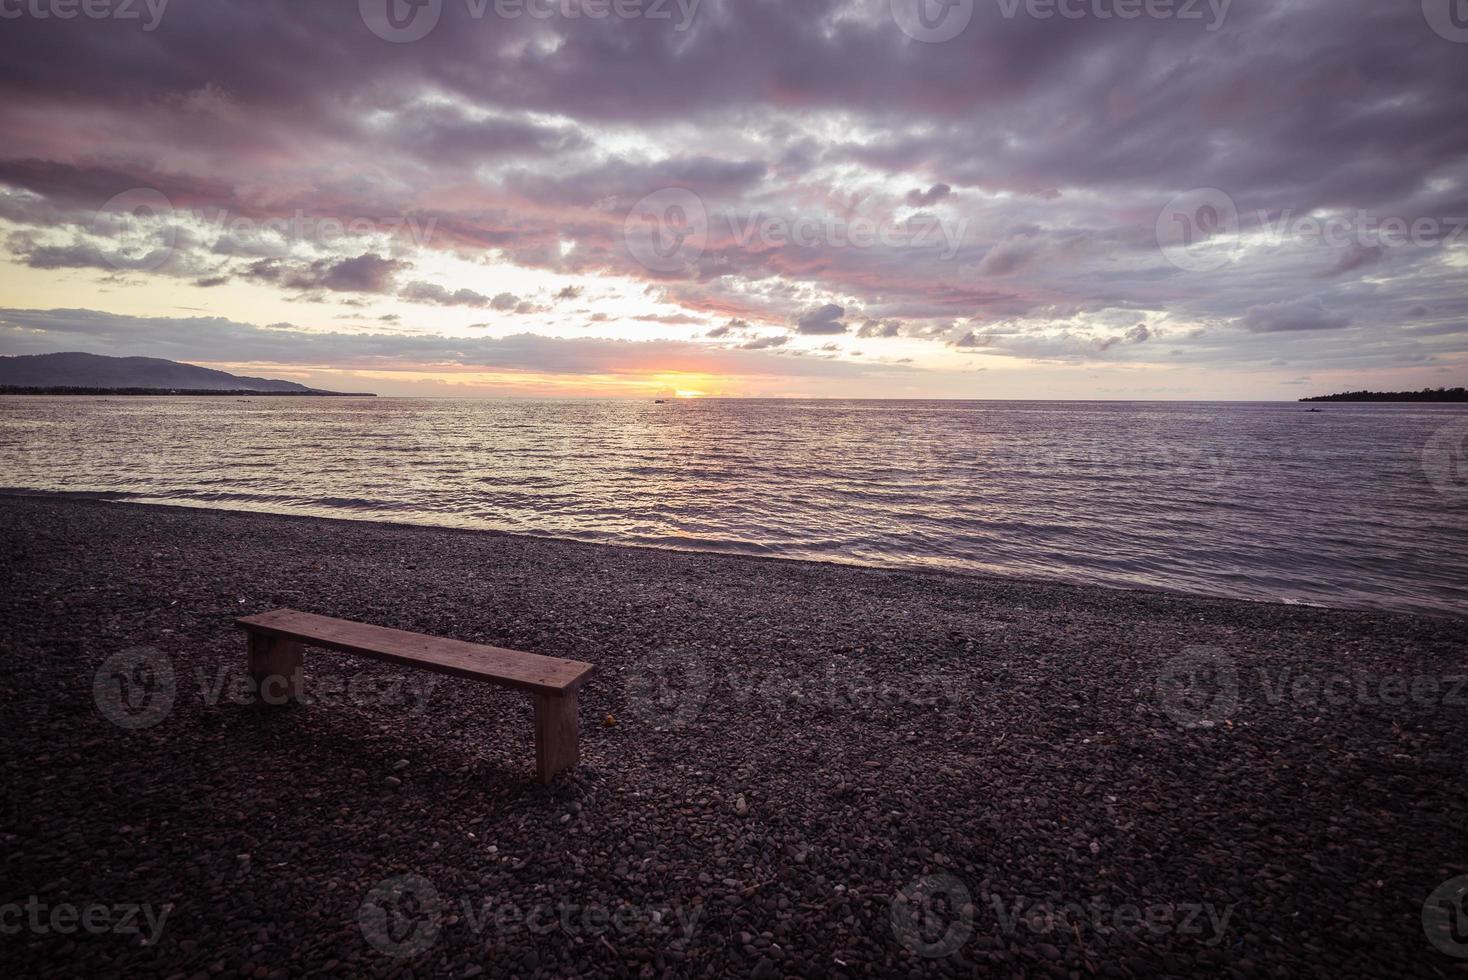 banco vazio na praia ao pôr do sol, marsala em tons foto